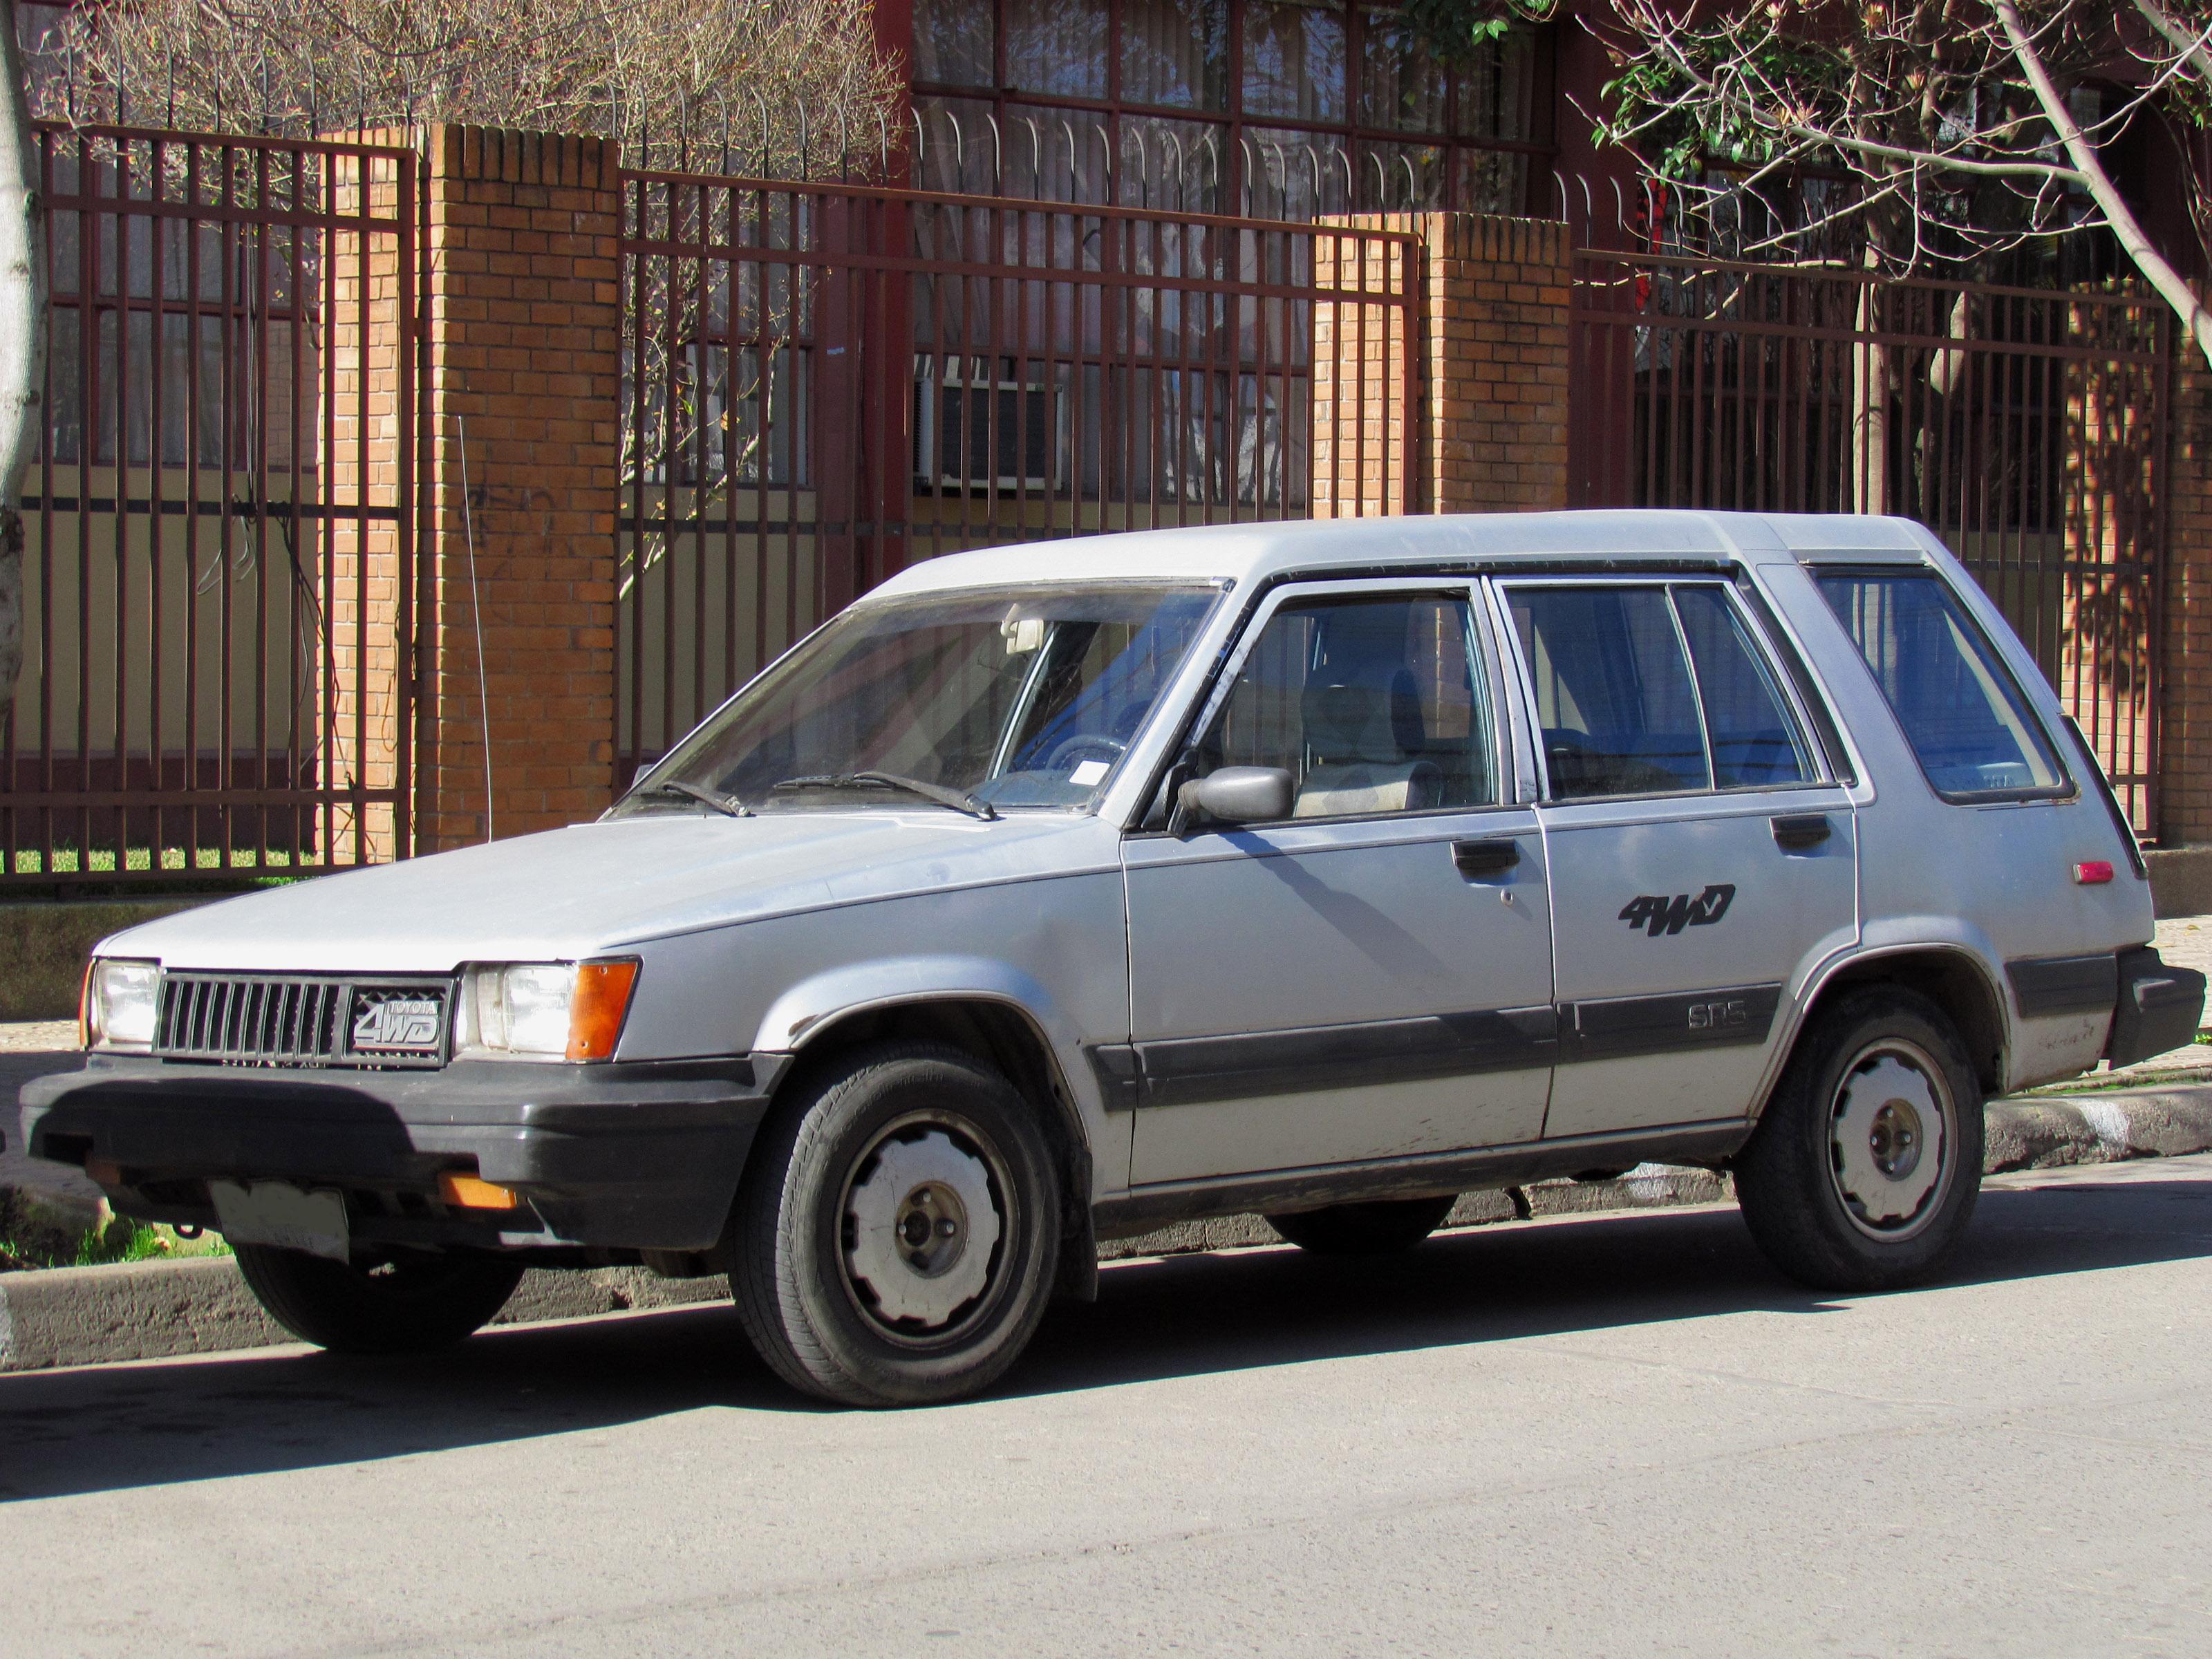 Toyota_Tercel_1.6_SR5_4WD_1985_(18933562